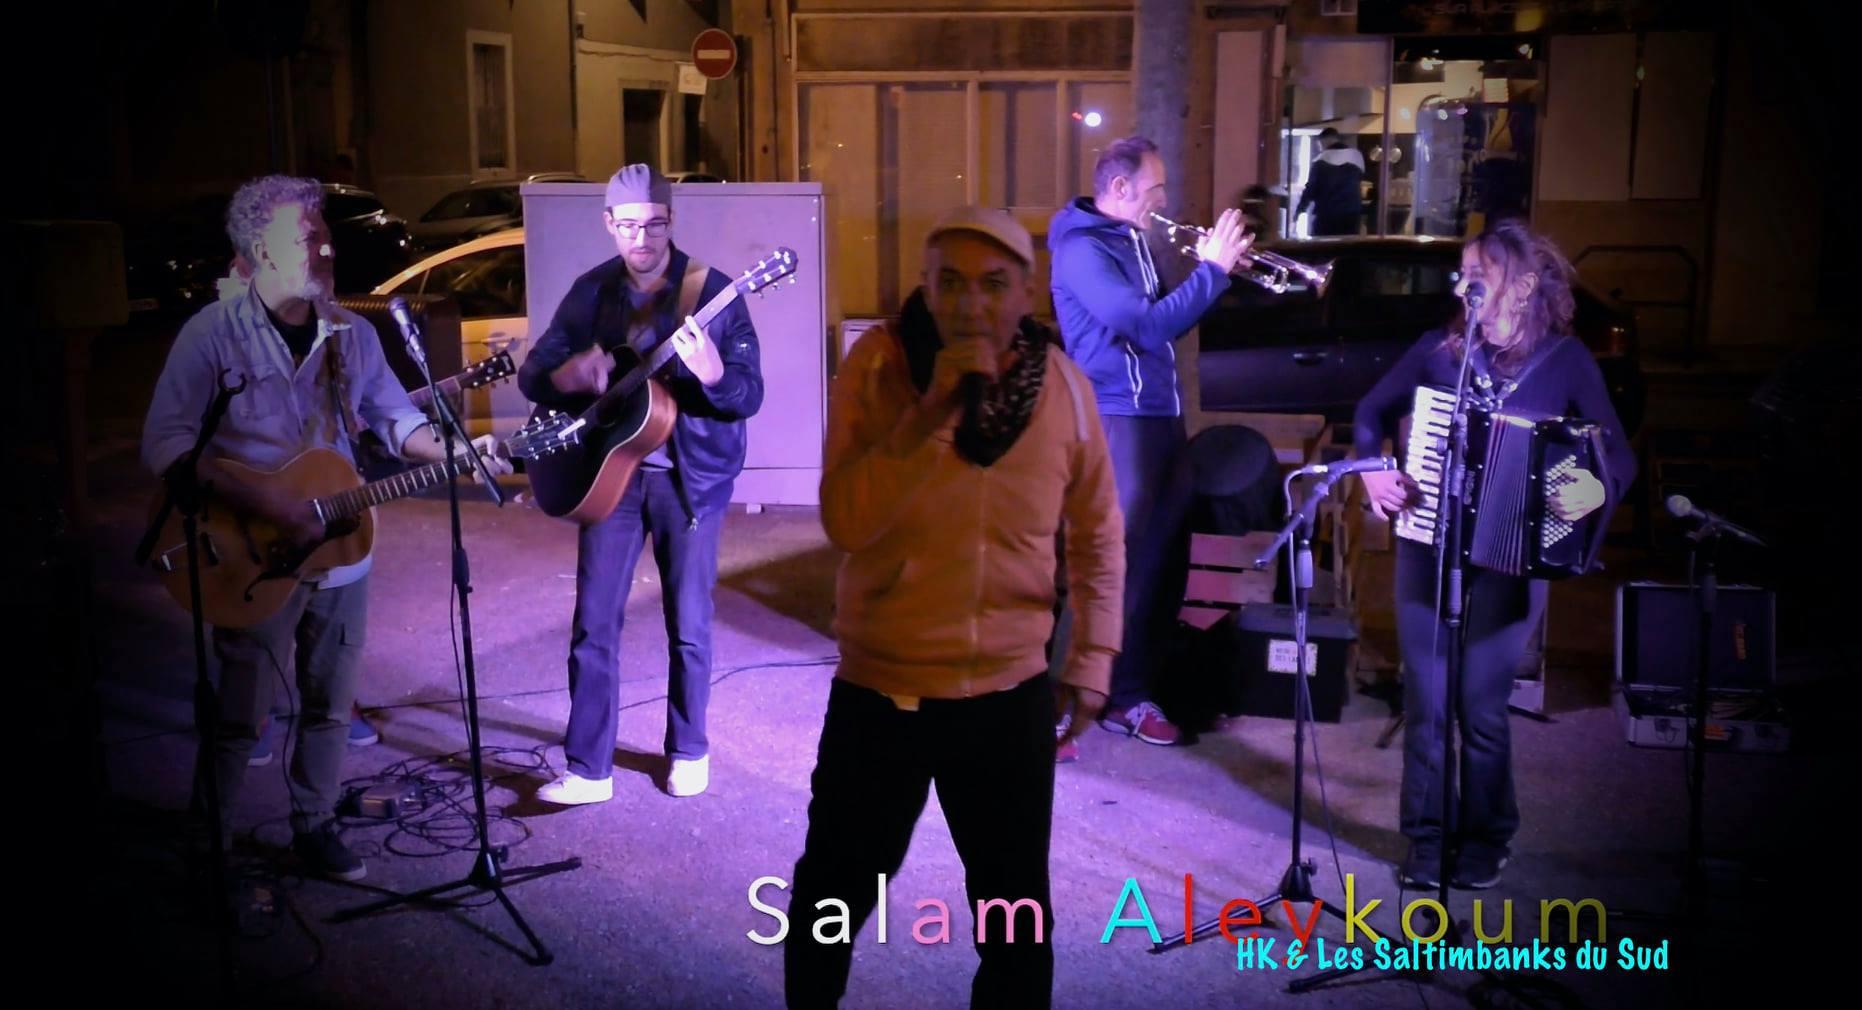 1634832803 HK Les Saltimbanks musical phenomenon on the roads of